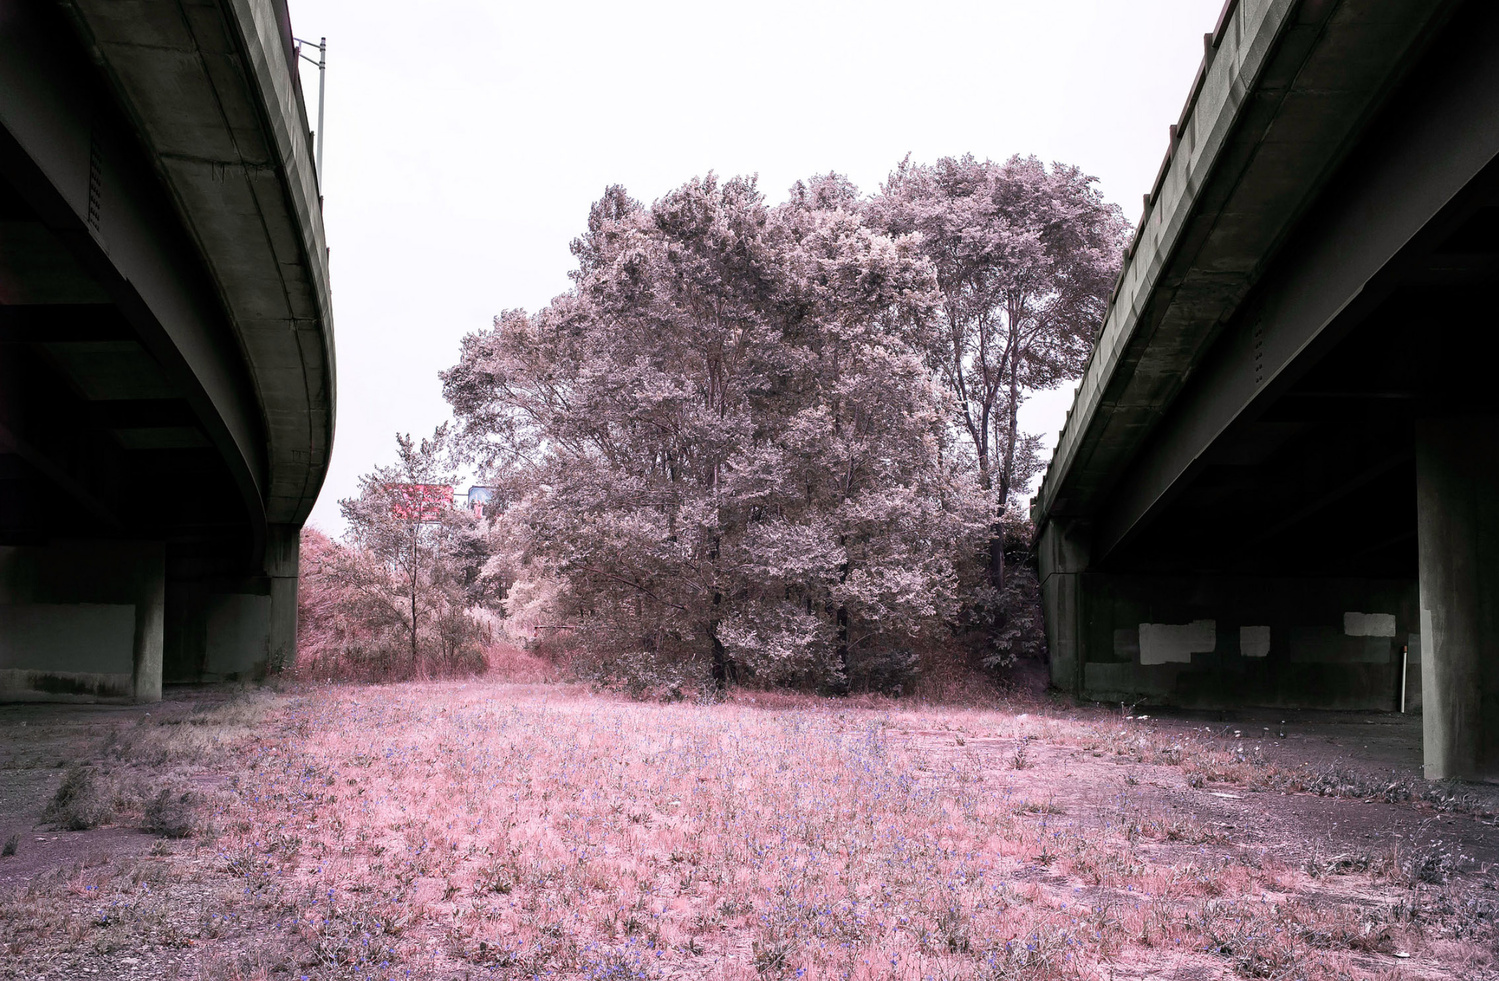 Between 2 bridges. by Ian Pettigrew